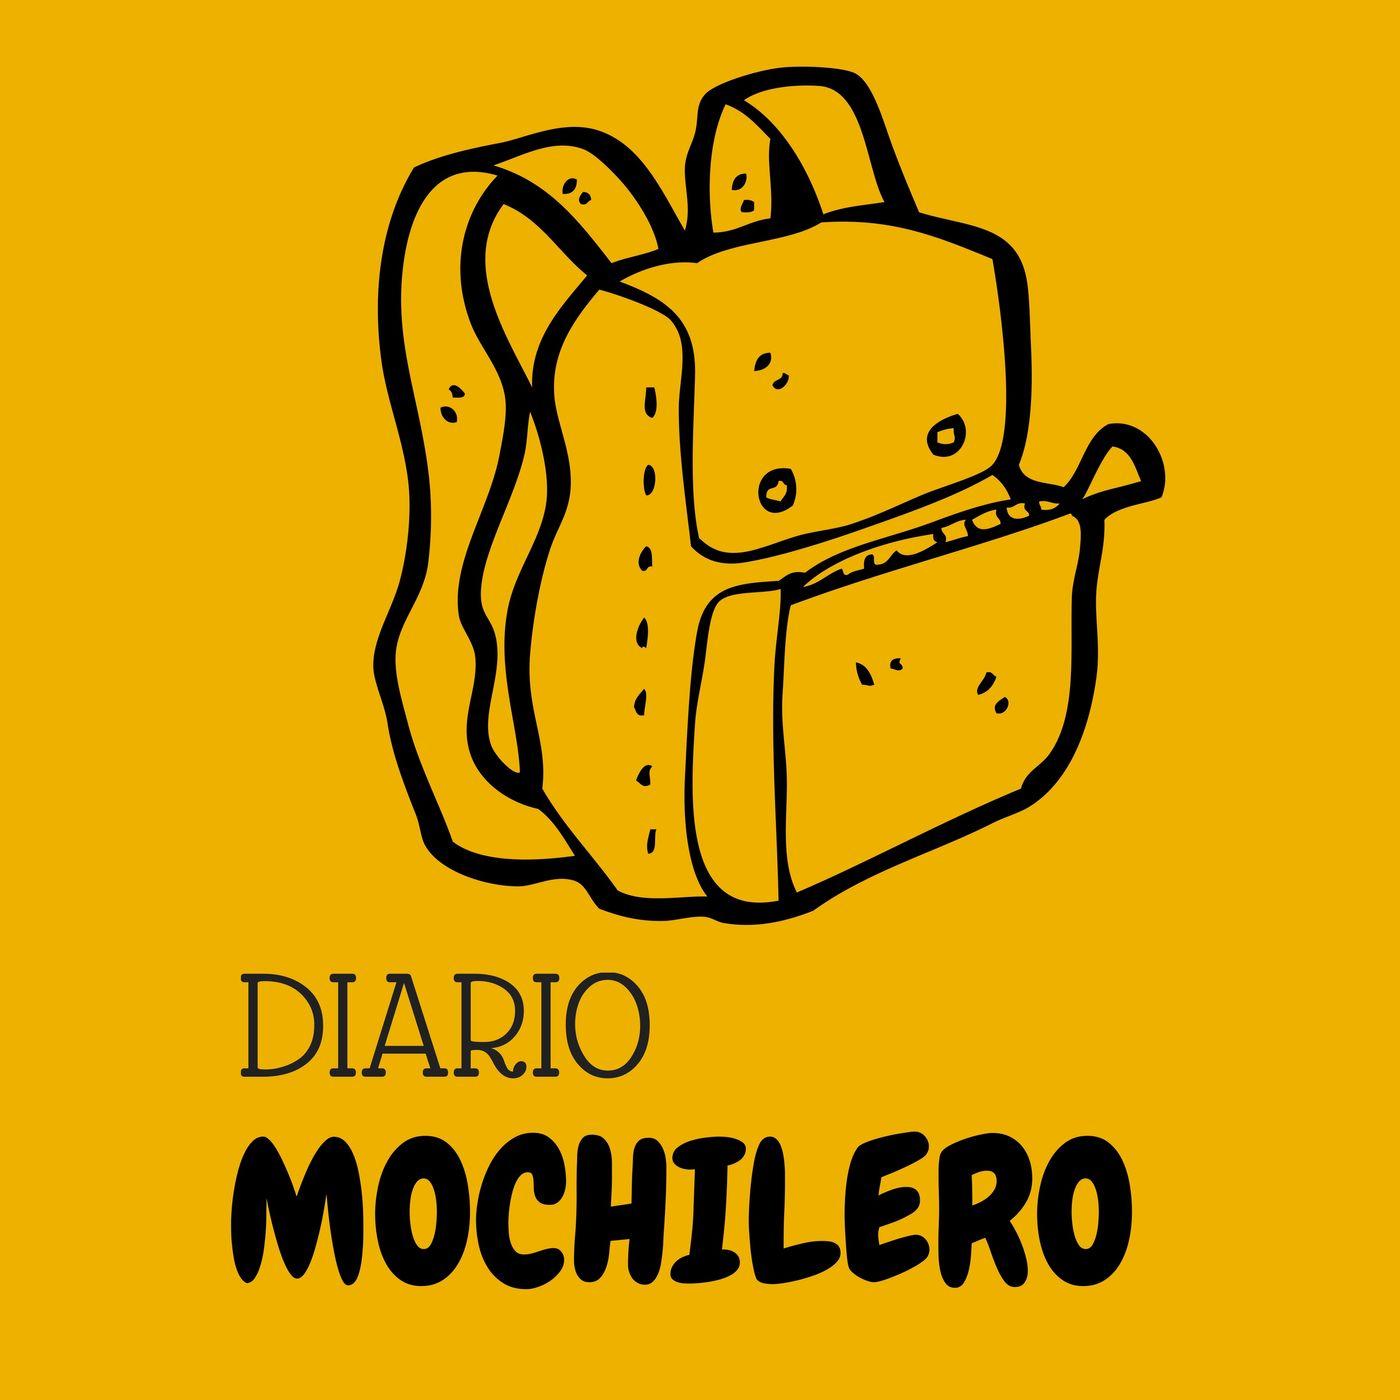 Logo de Diario Mochilero - Tailandia